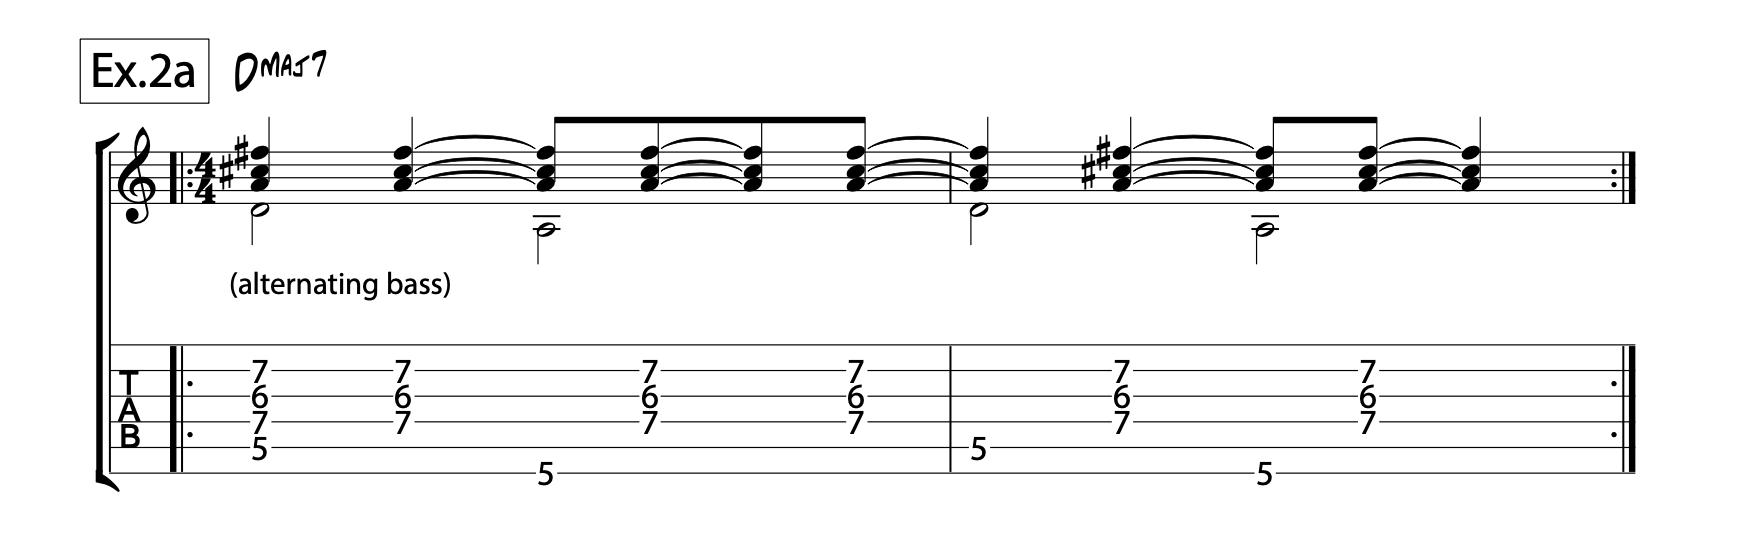 2a-brazilian-guitar-chords